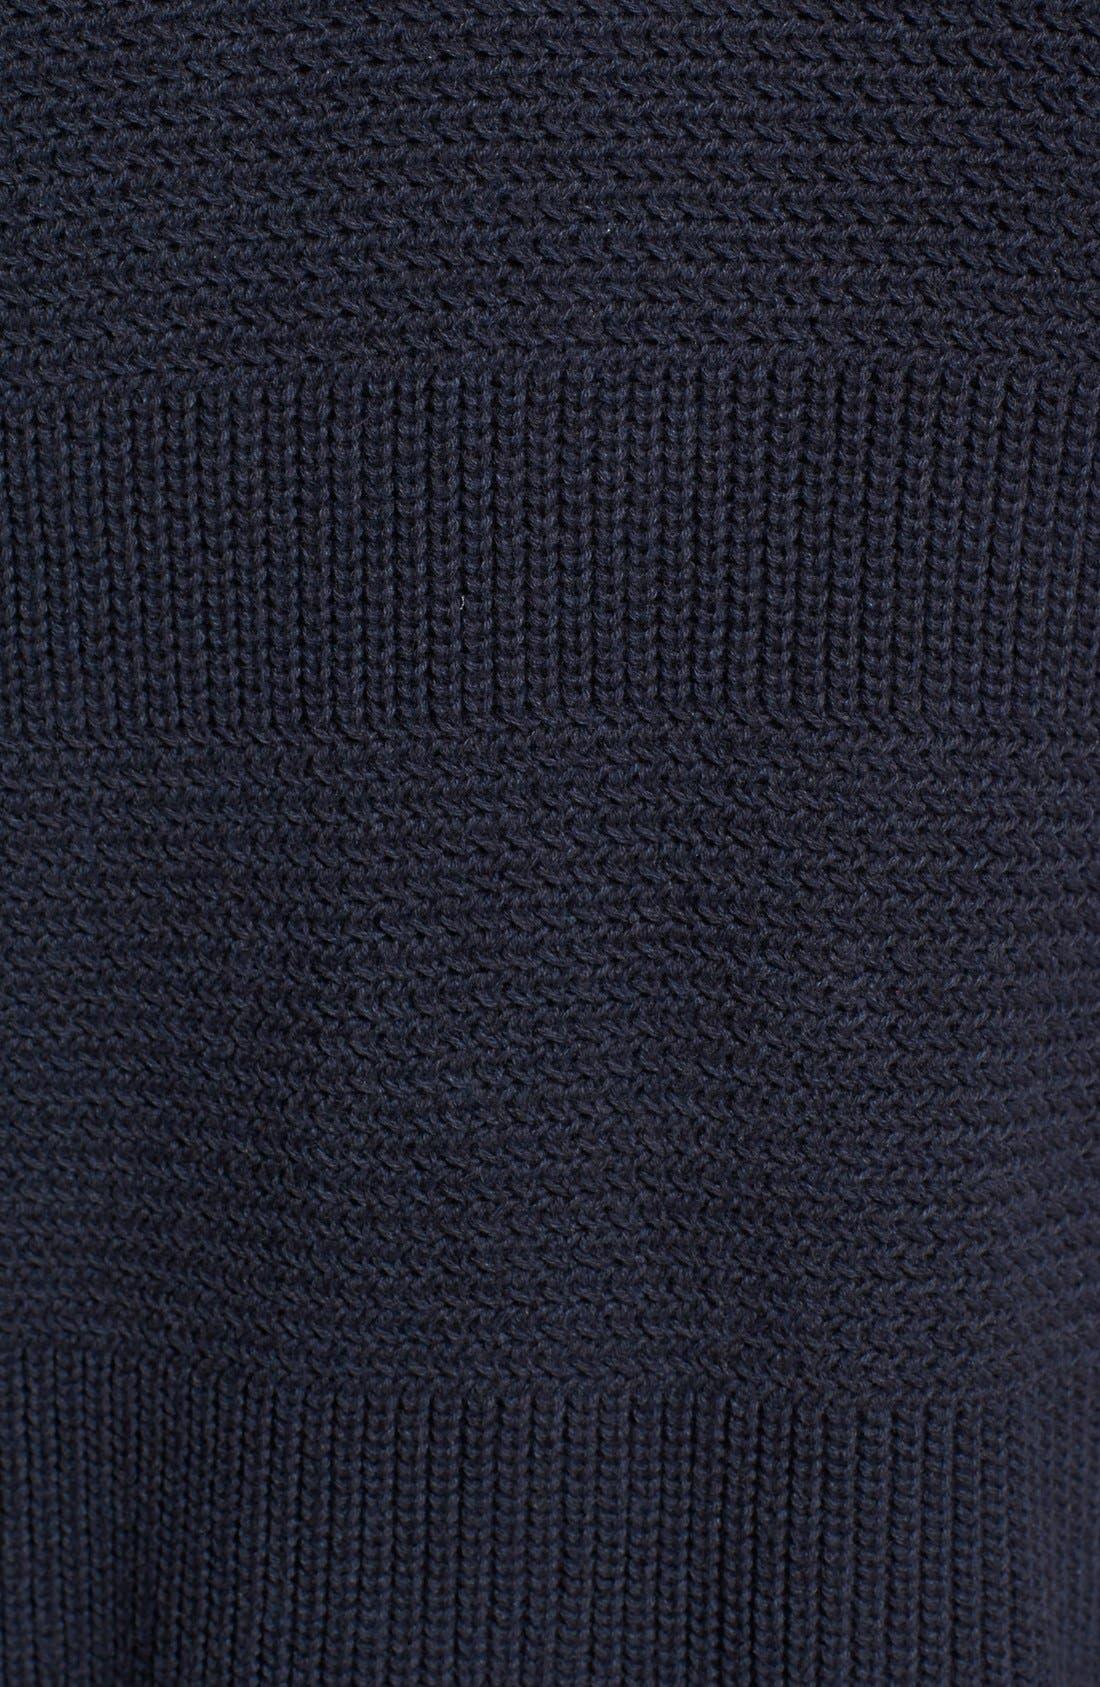 Alternate Image 3  - 1901 Textured Knit Shawl Cardigan